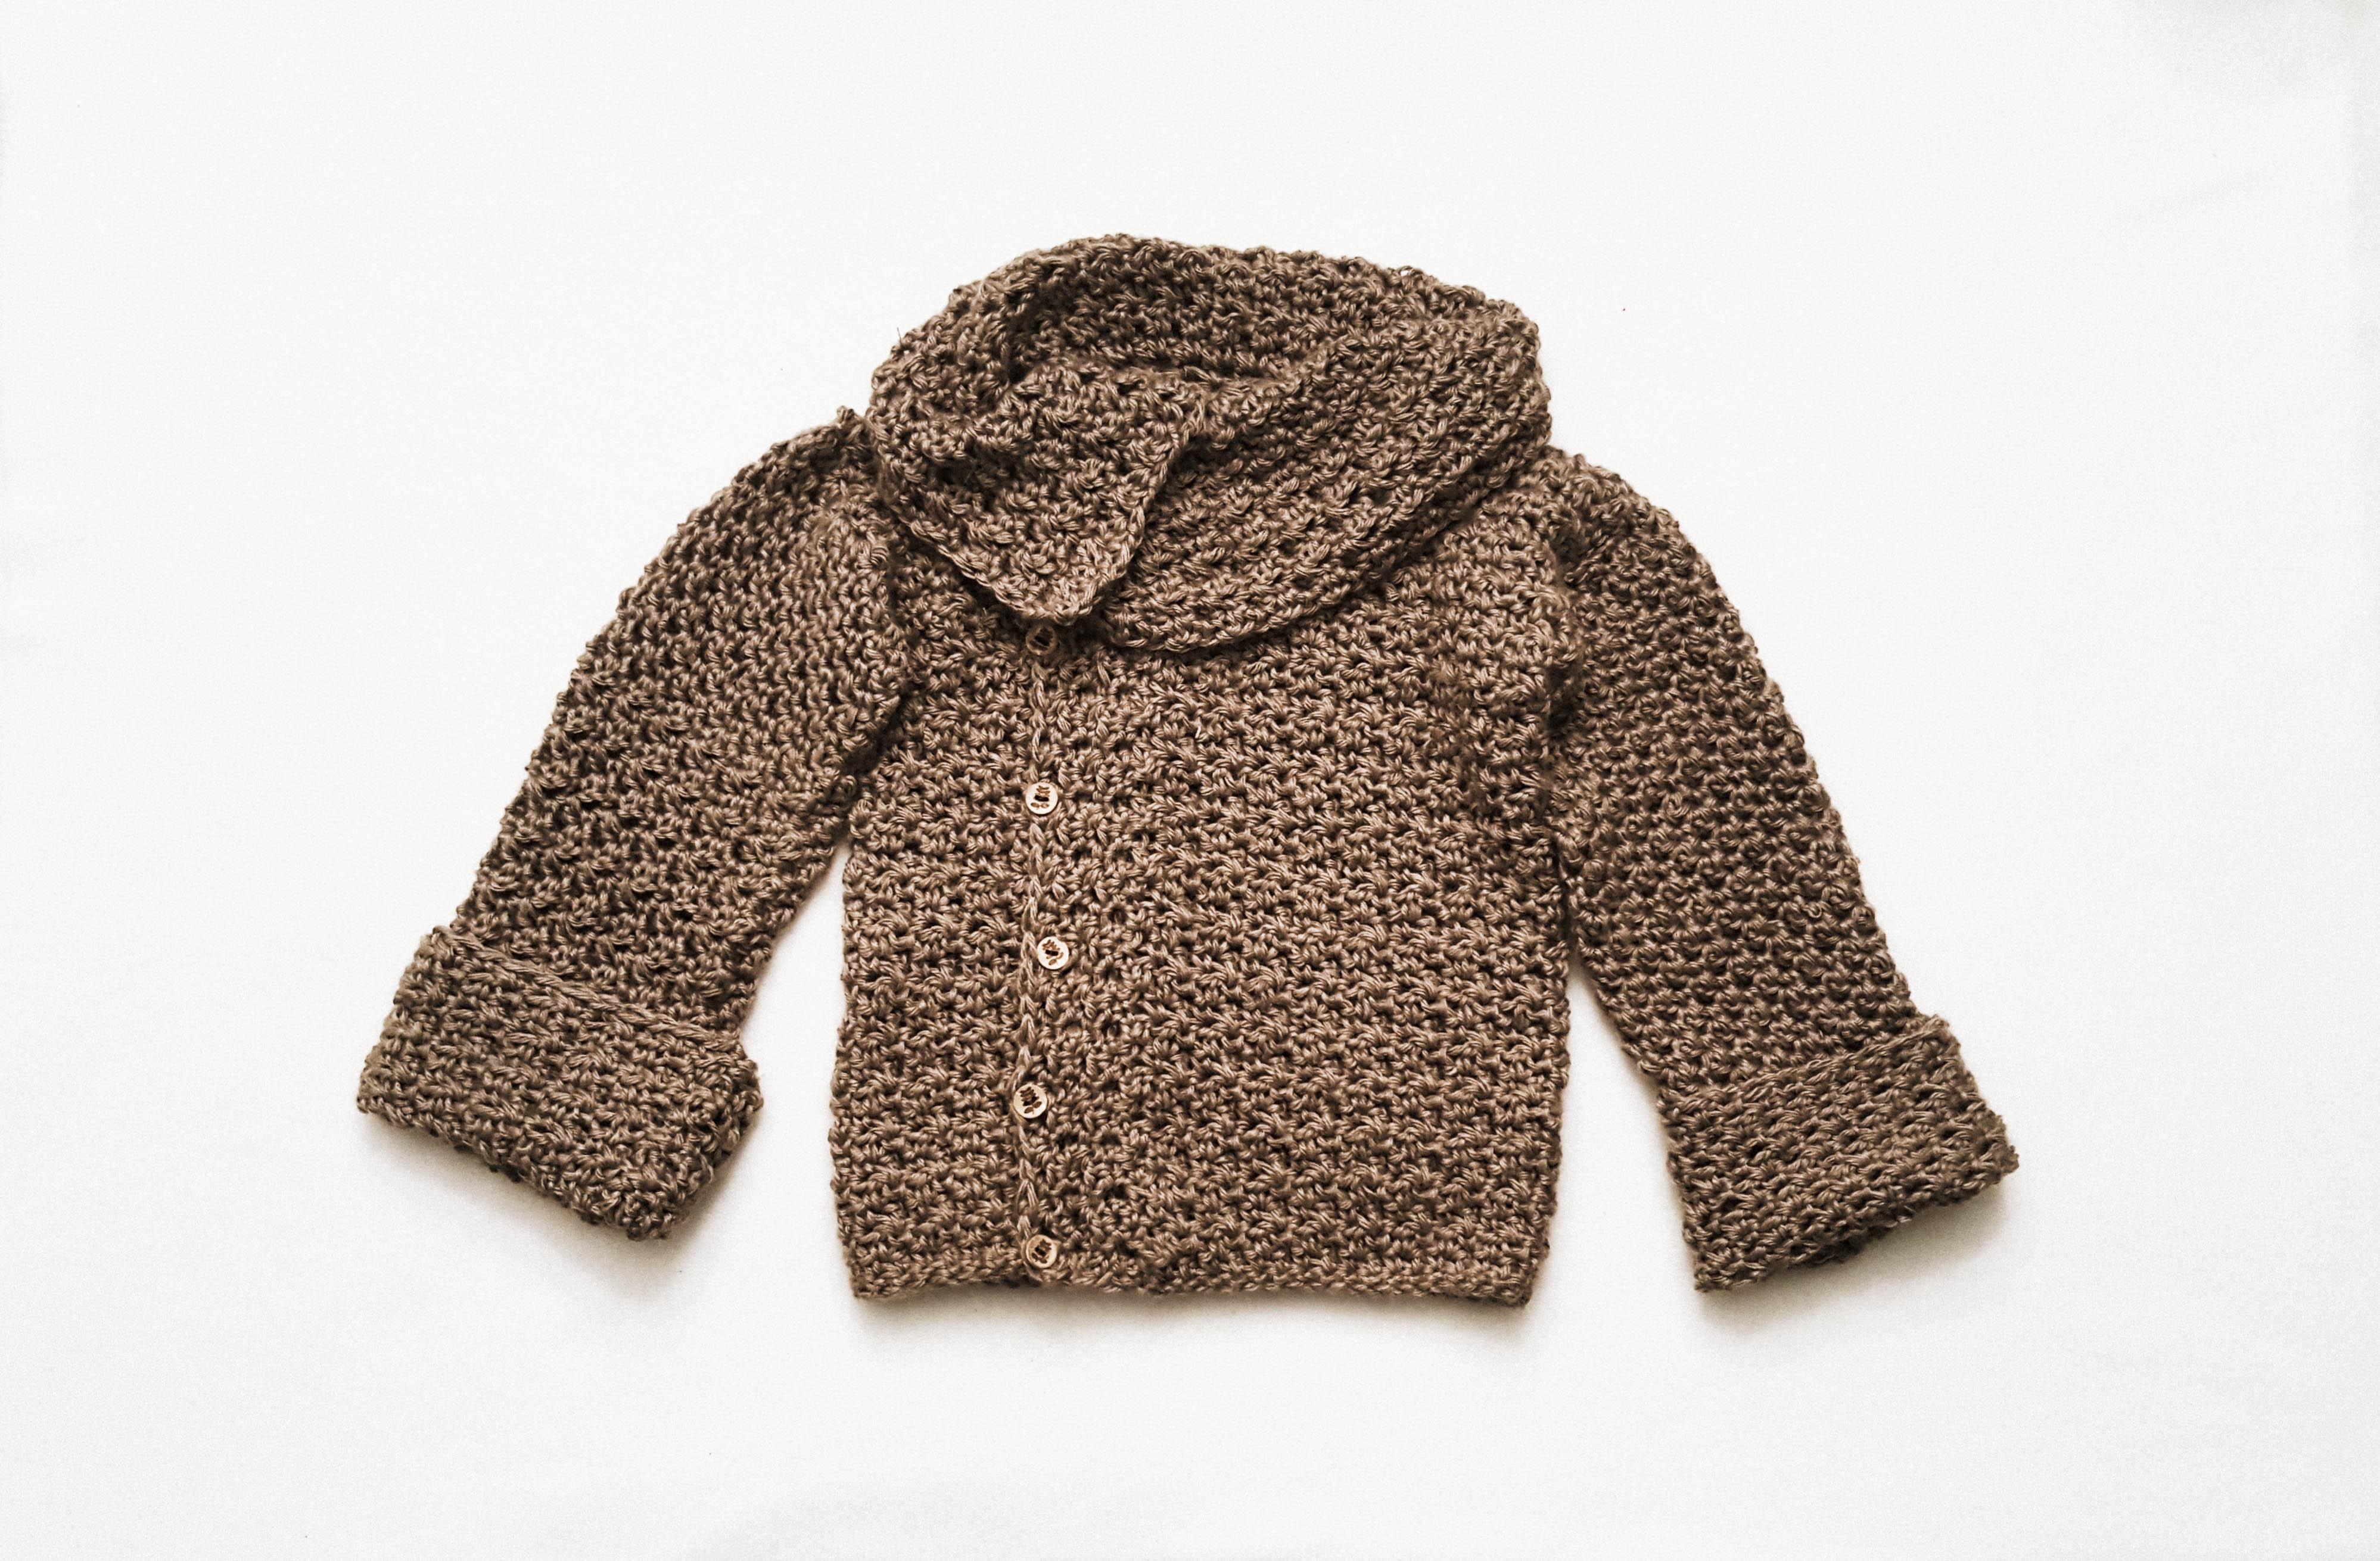 Toddler Crochet Sweater Pattern By Montano Hobium Blog